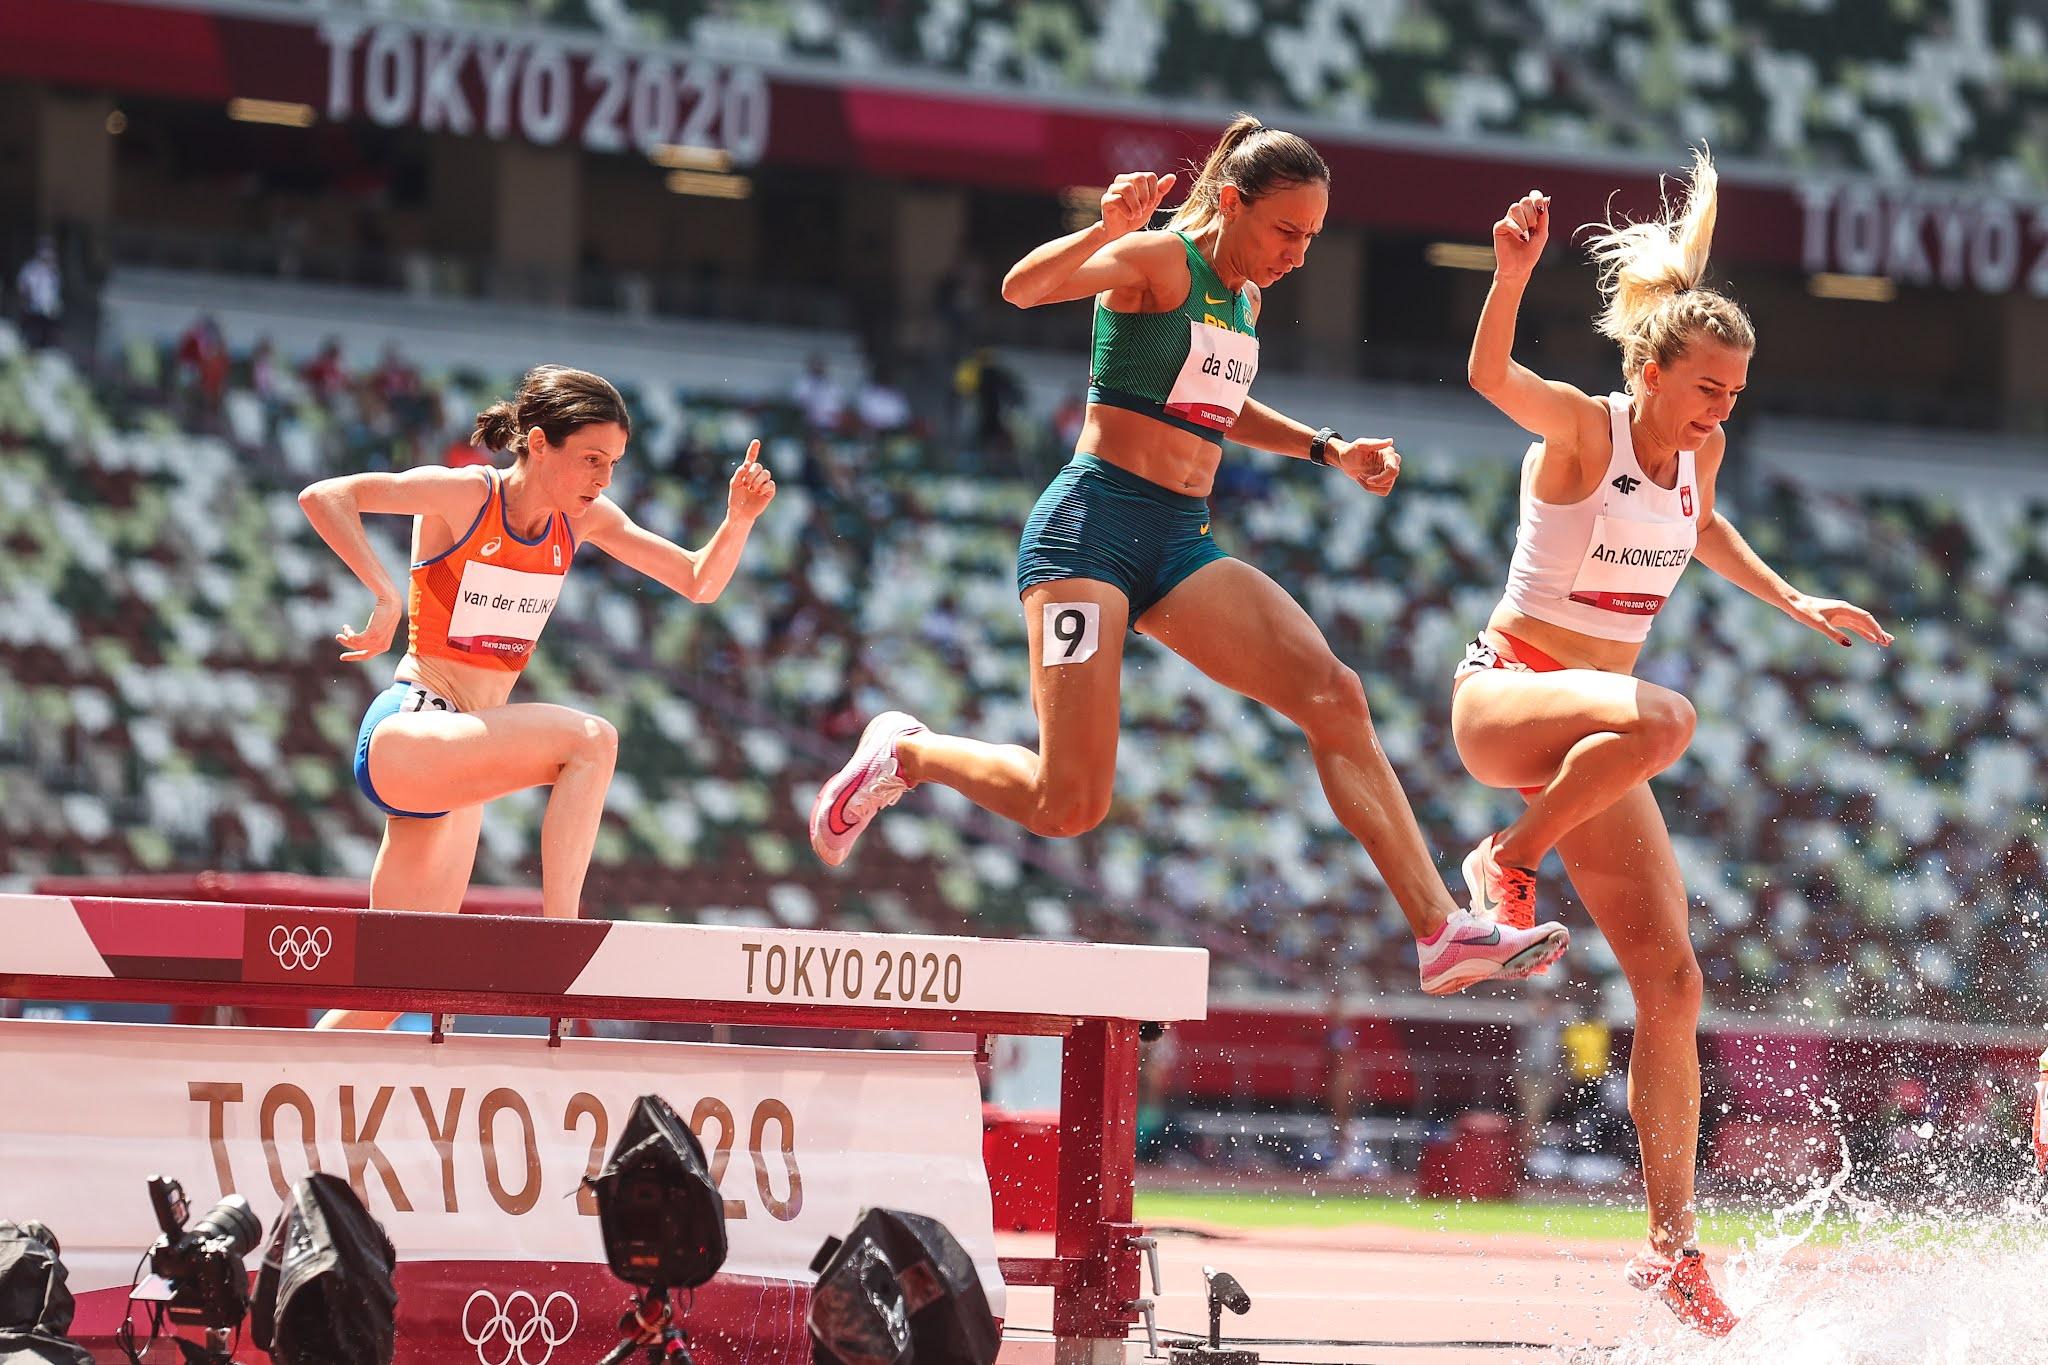 Atletismo Brasil Olimpíadas 3.000m com obstáculos